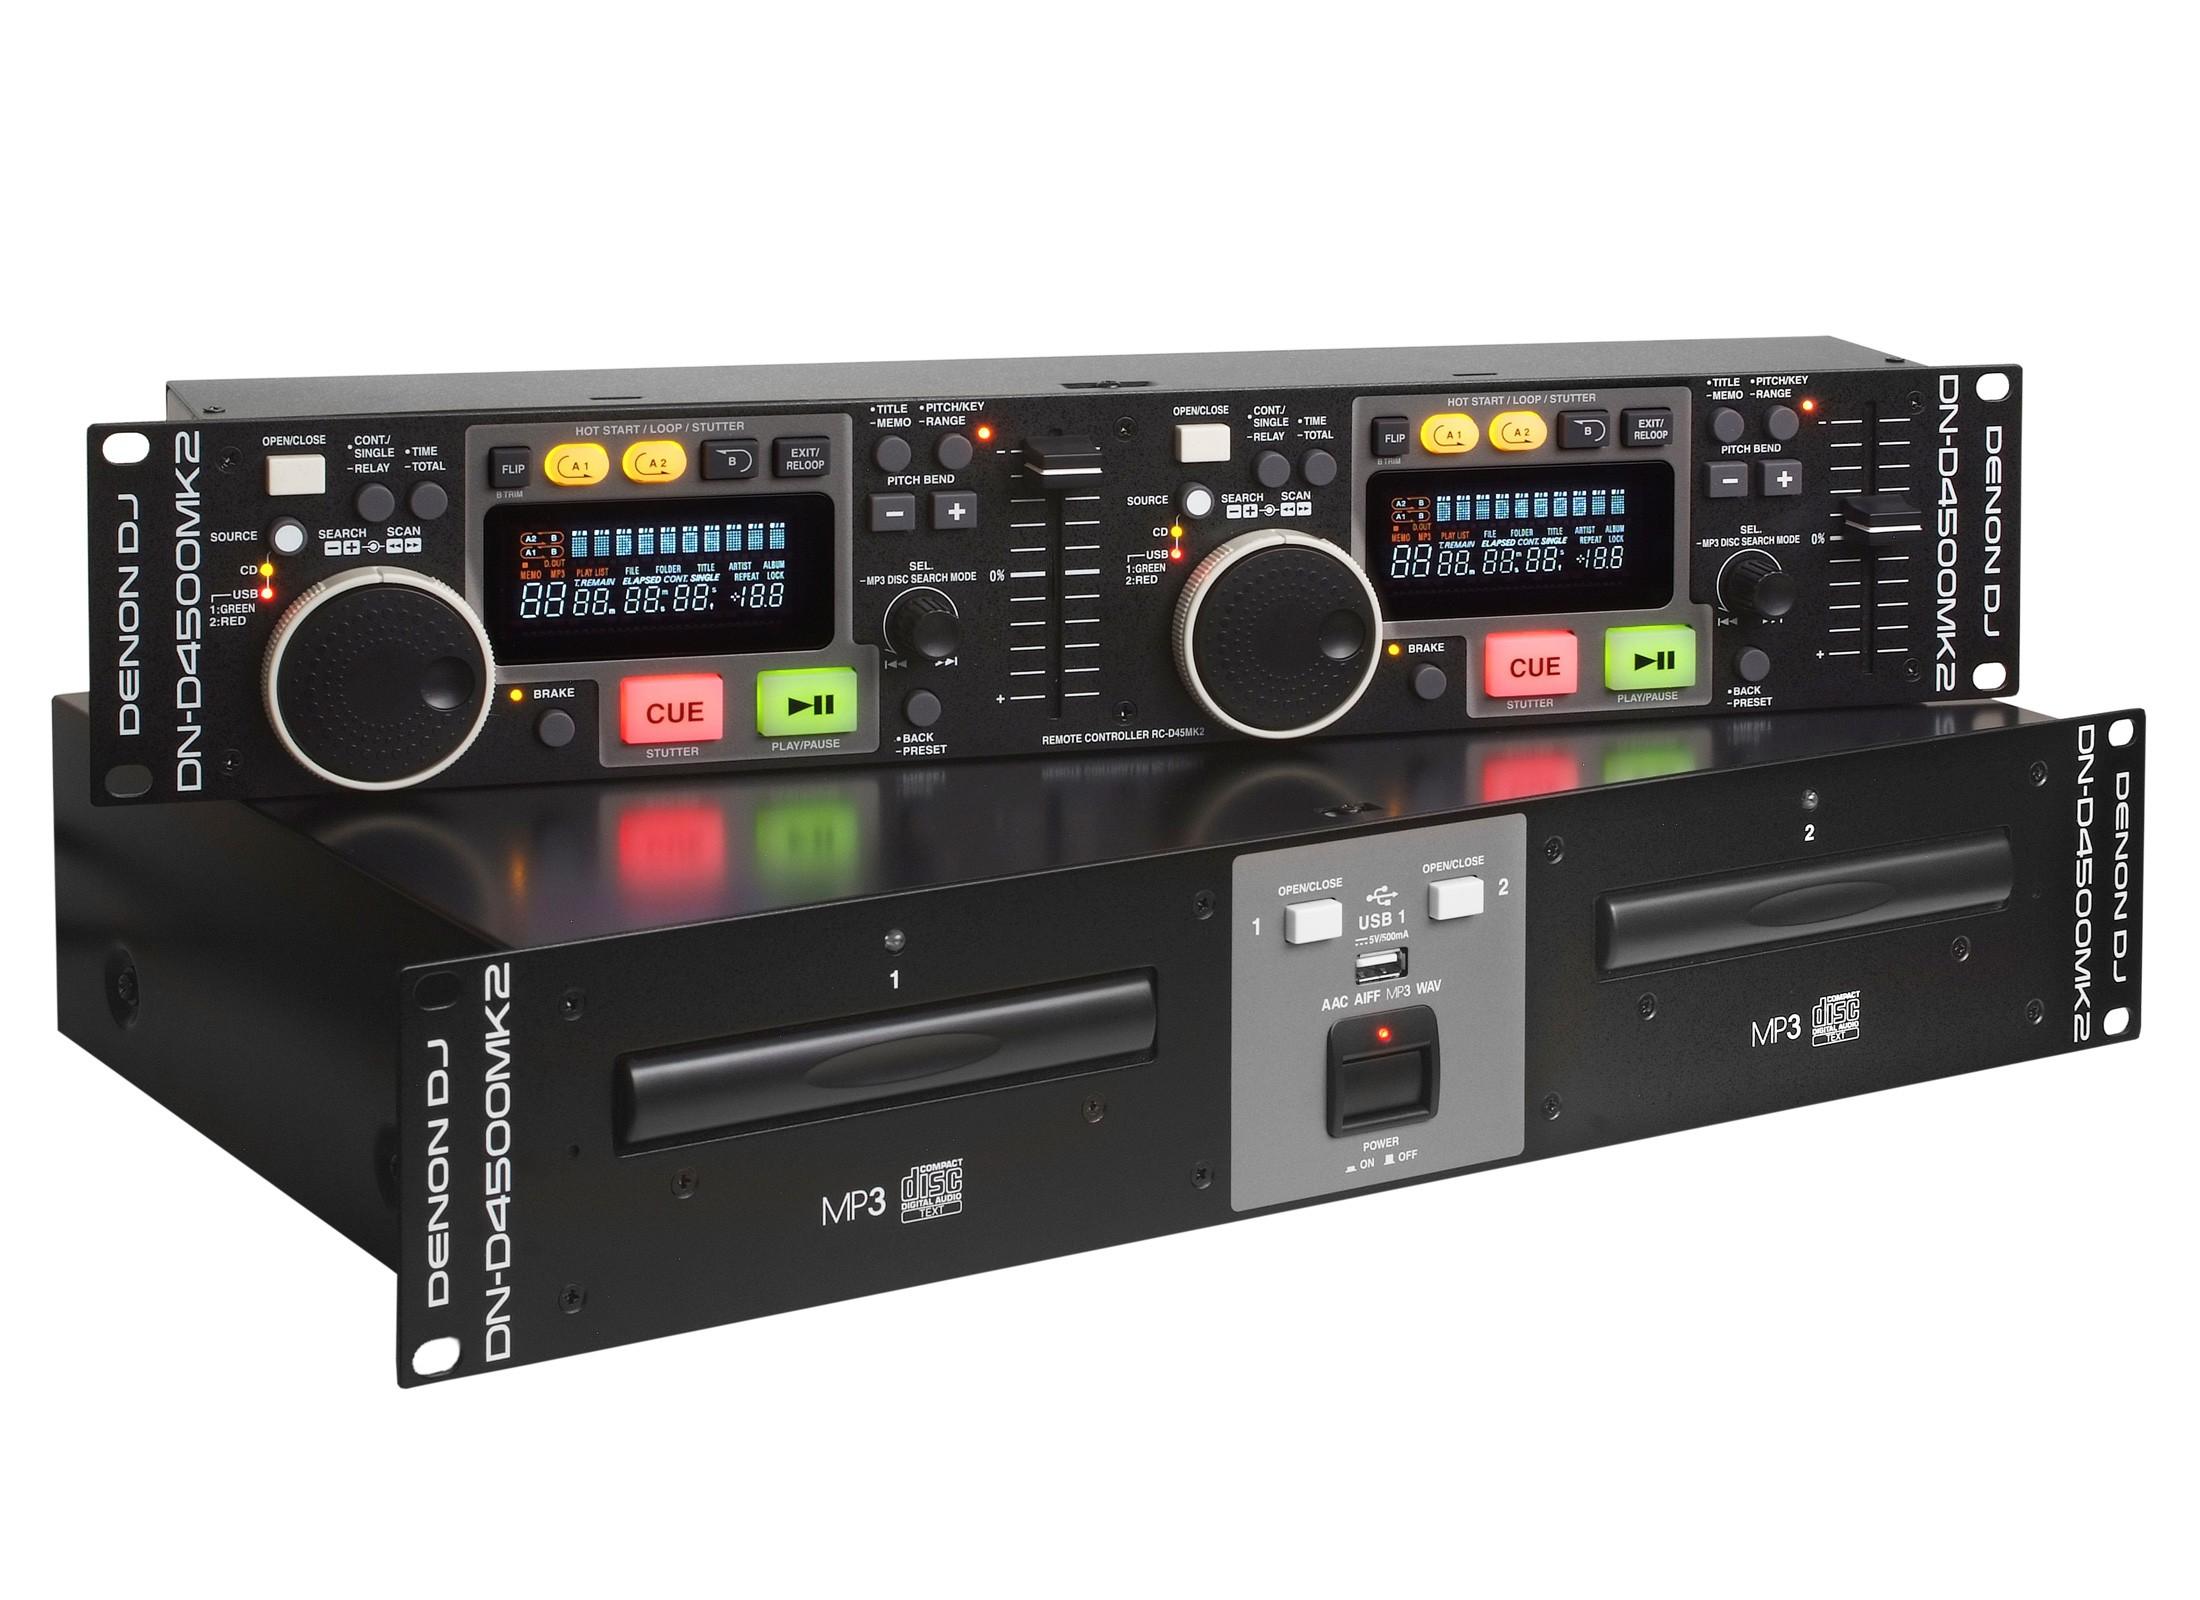 Denon DN-D4500 MKII Double CD / MP3 / USB Player - 1 ...